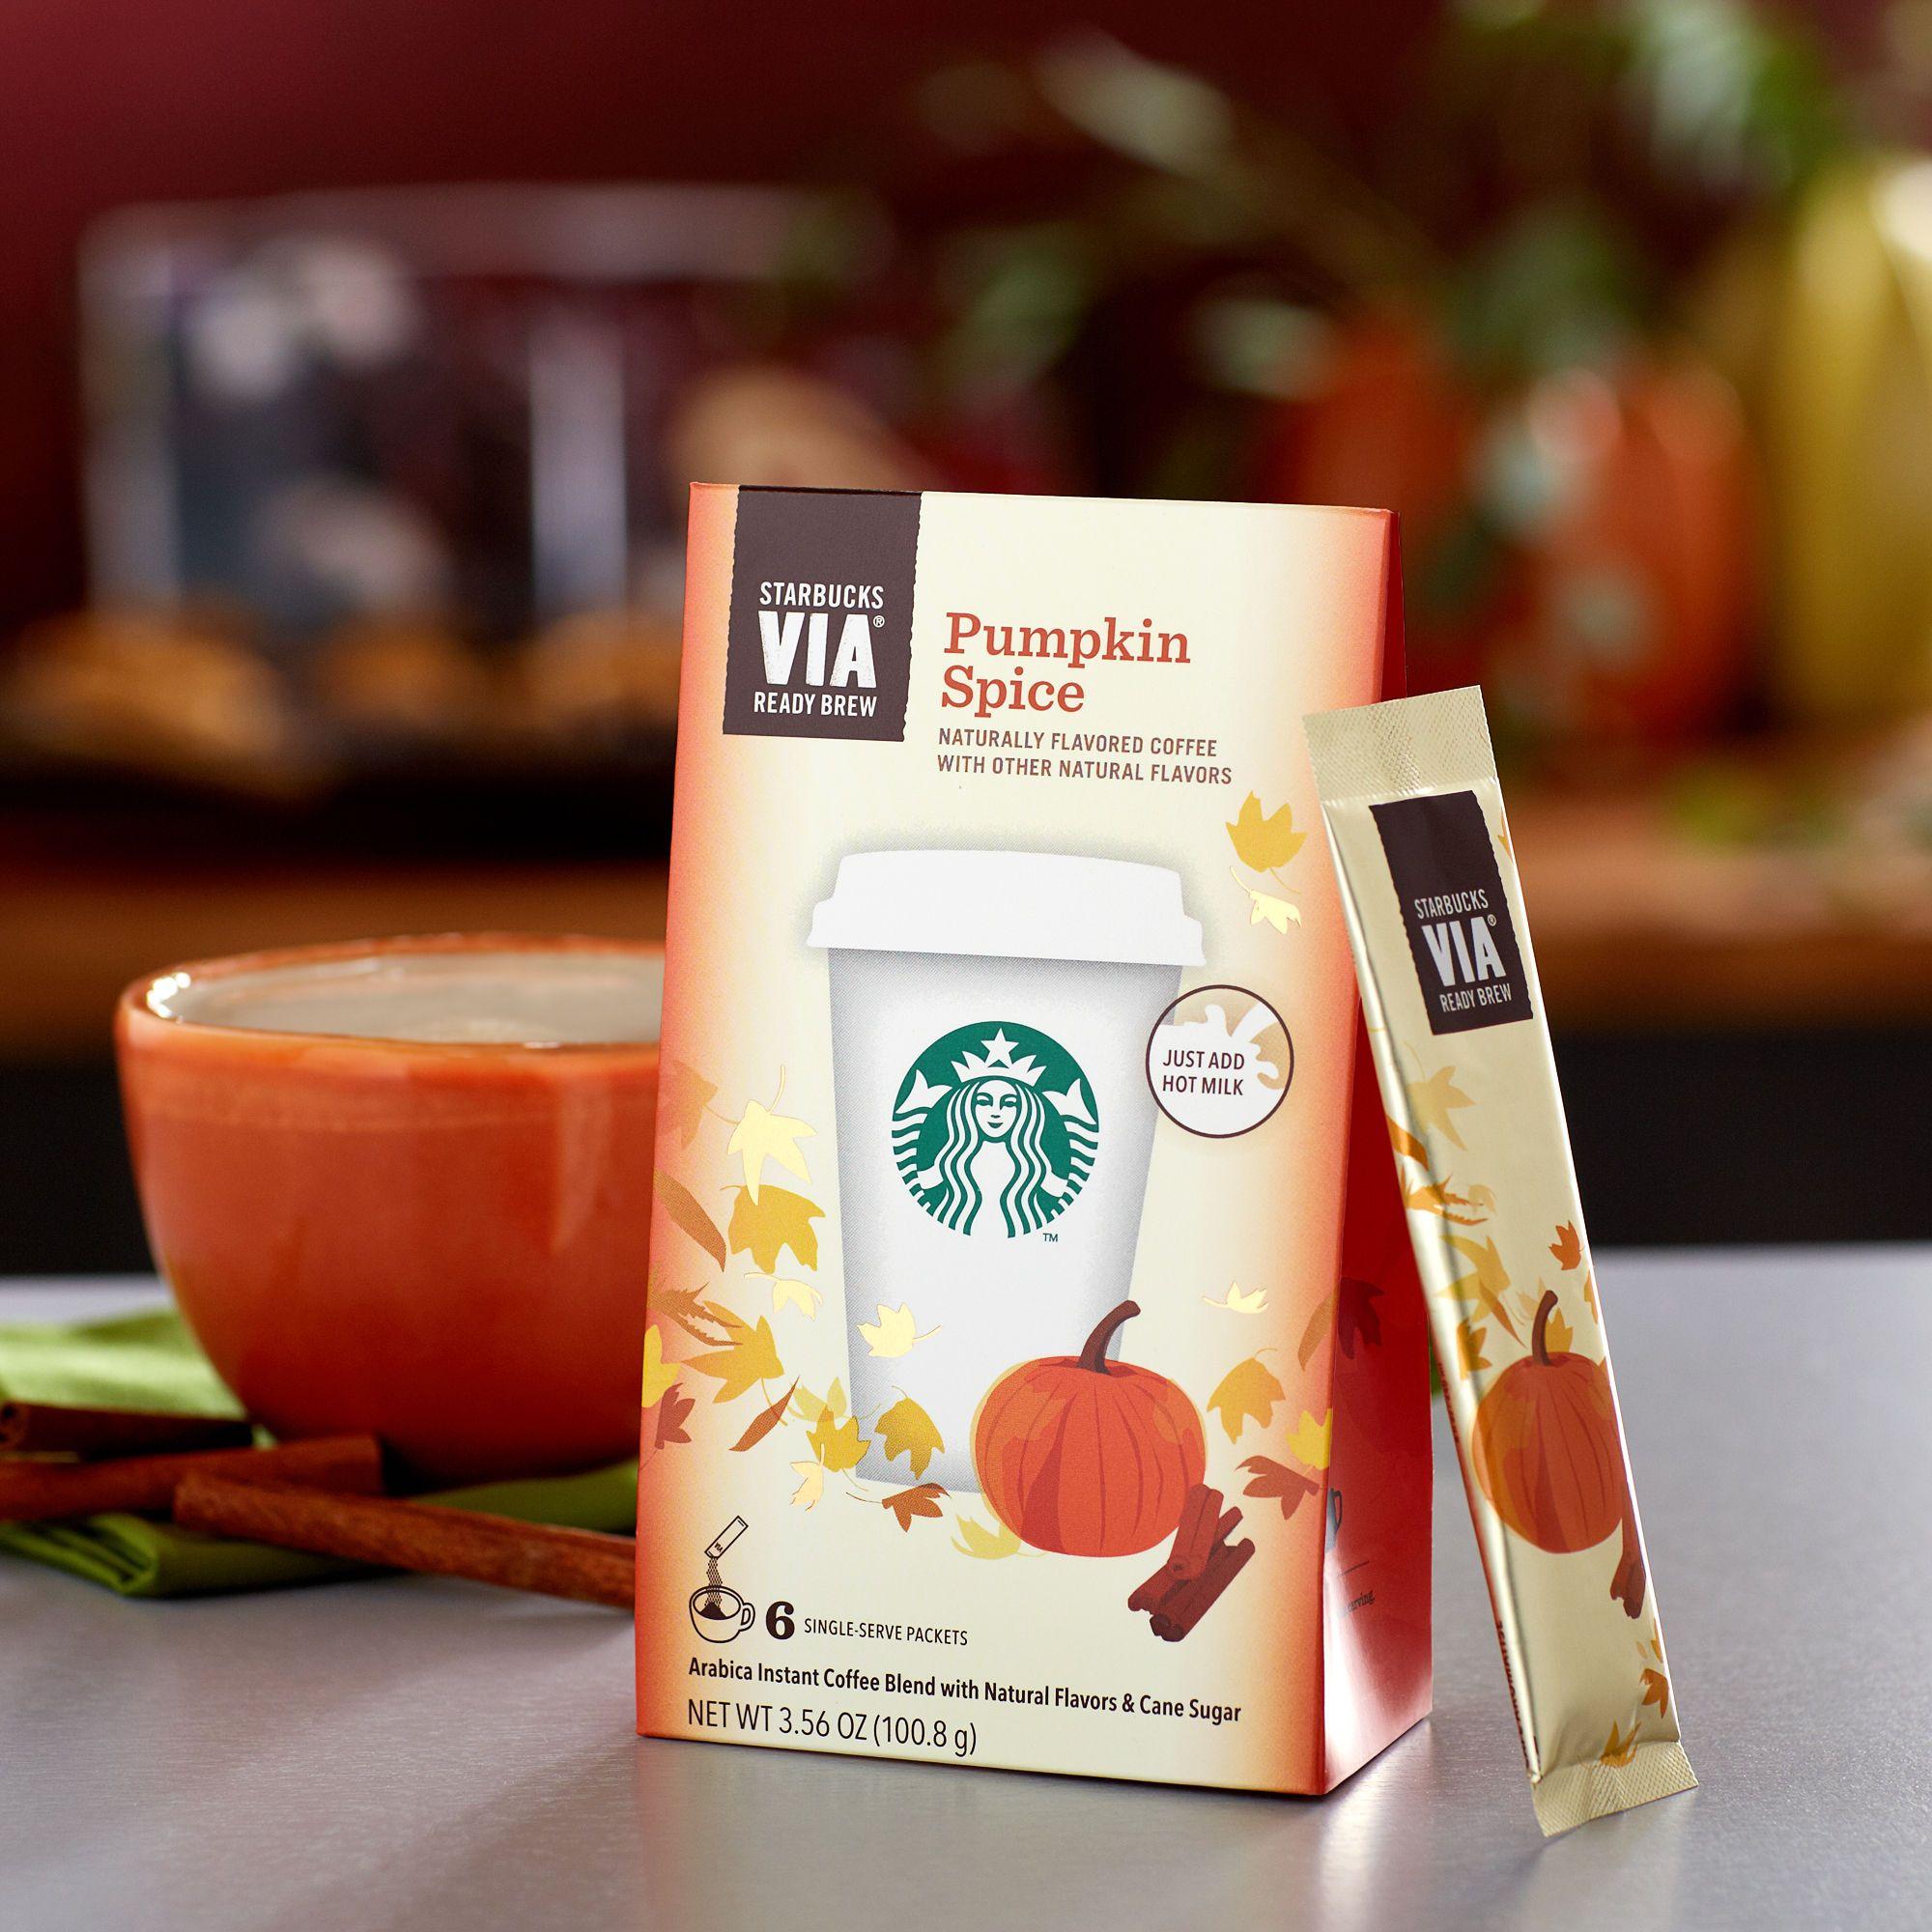 Starbucks Via Pumpkin Spice Make A Pumpkin Spice Latte